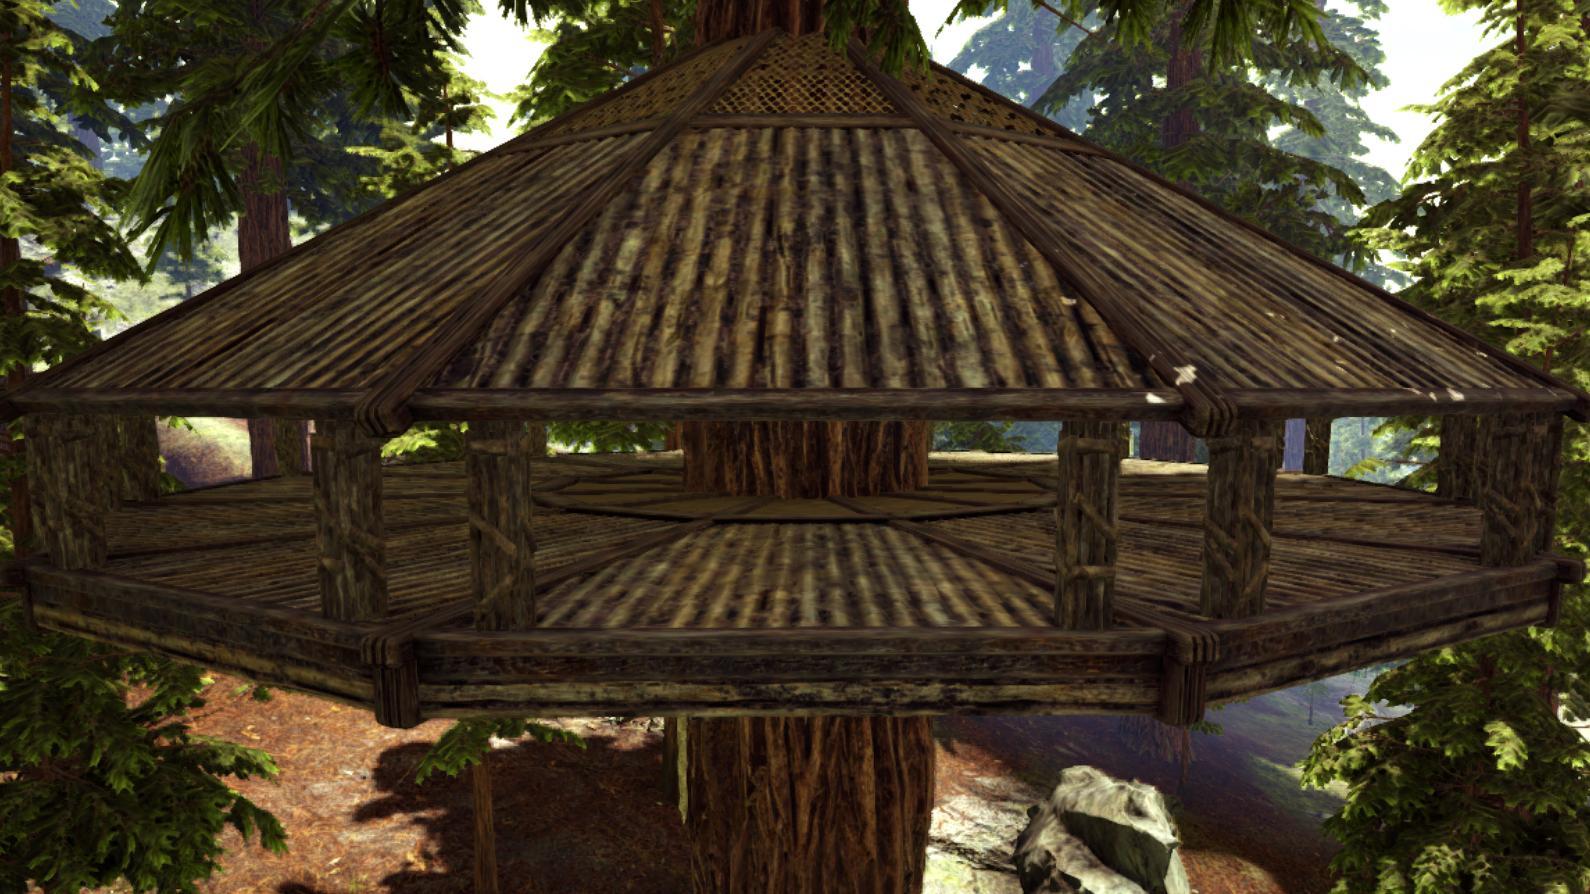 Ark Metal Tree Platform   28 Images   Metal Tree Platform Official ...